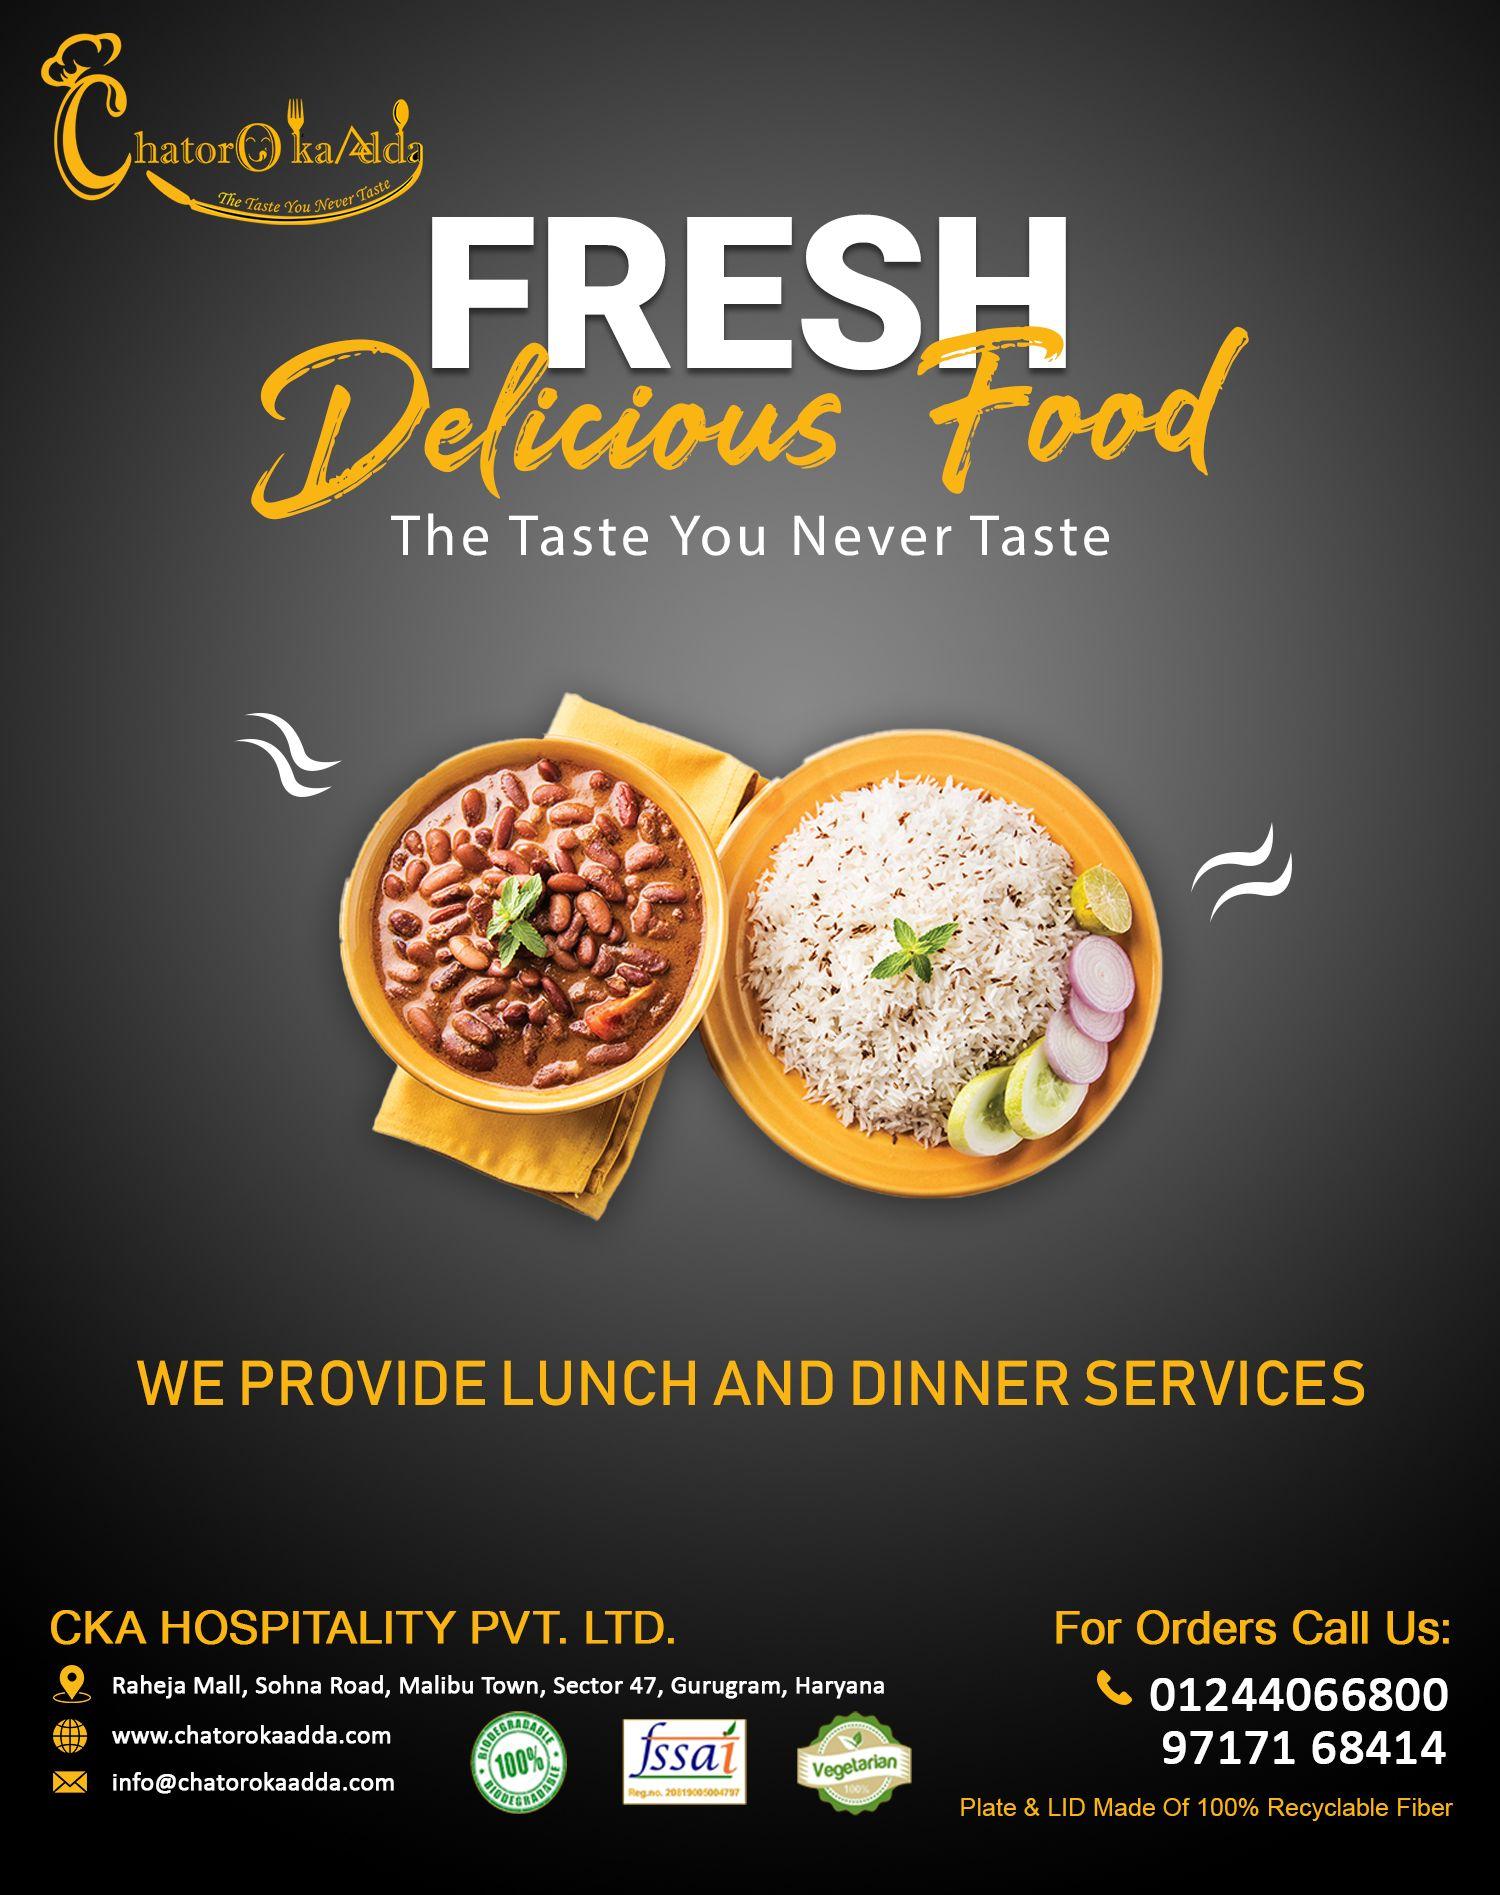 Best Restaurant In Gurgaon Instagram Food Food Graphic Design Food Poster Design